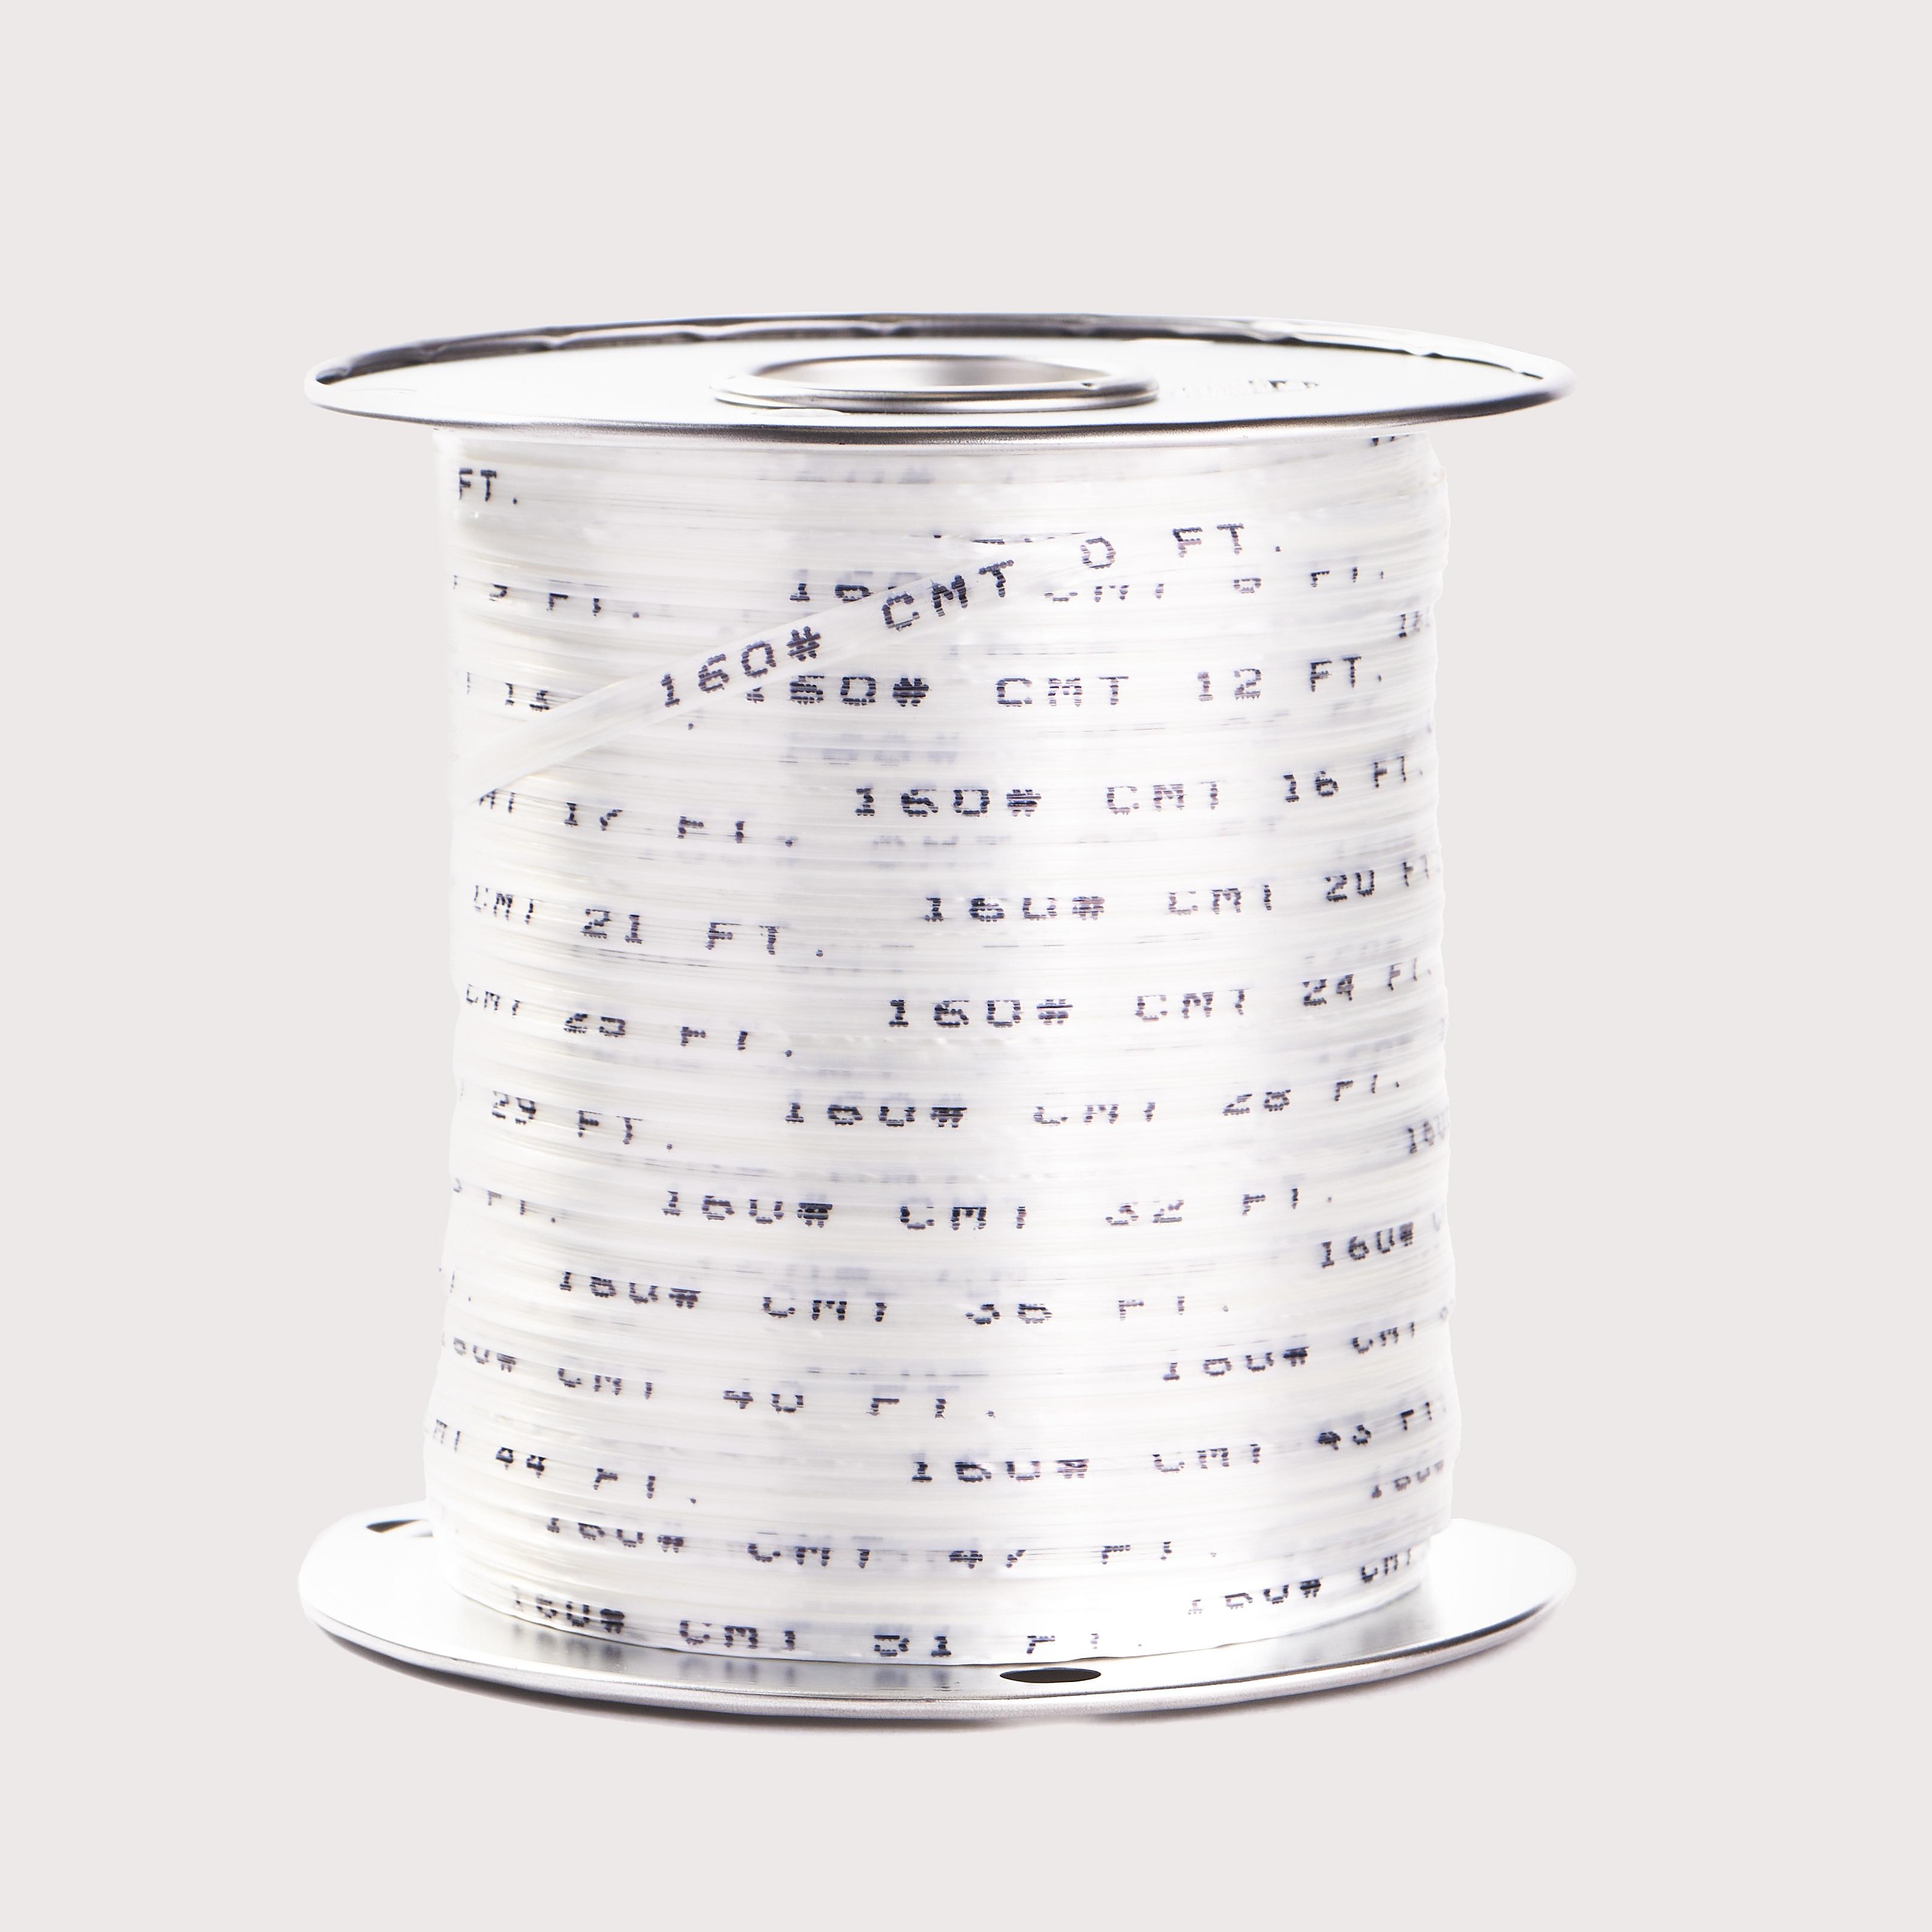 Orion-Cordage-Conduit Tape-White-Reel29.jpg